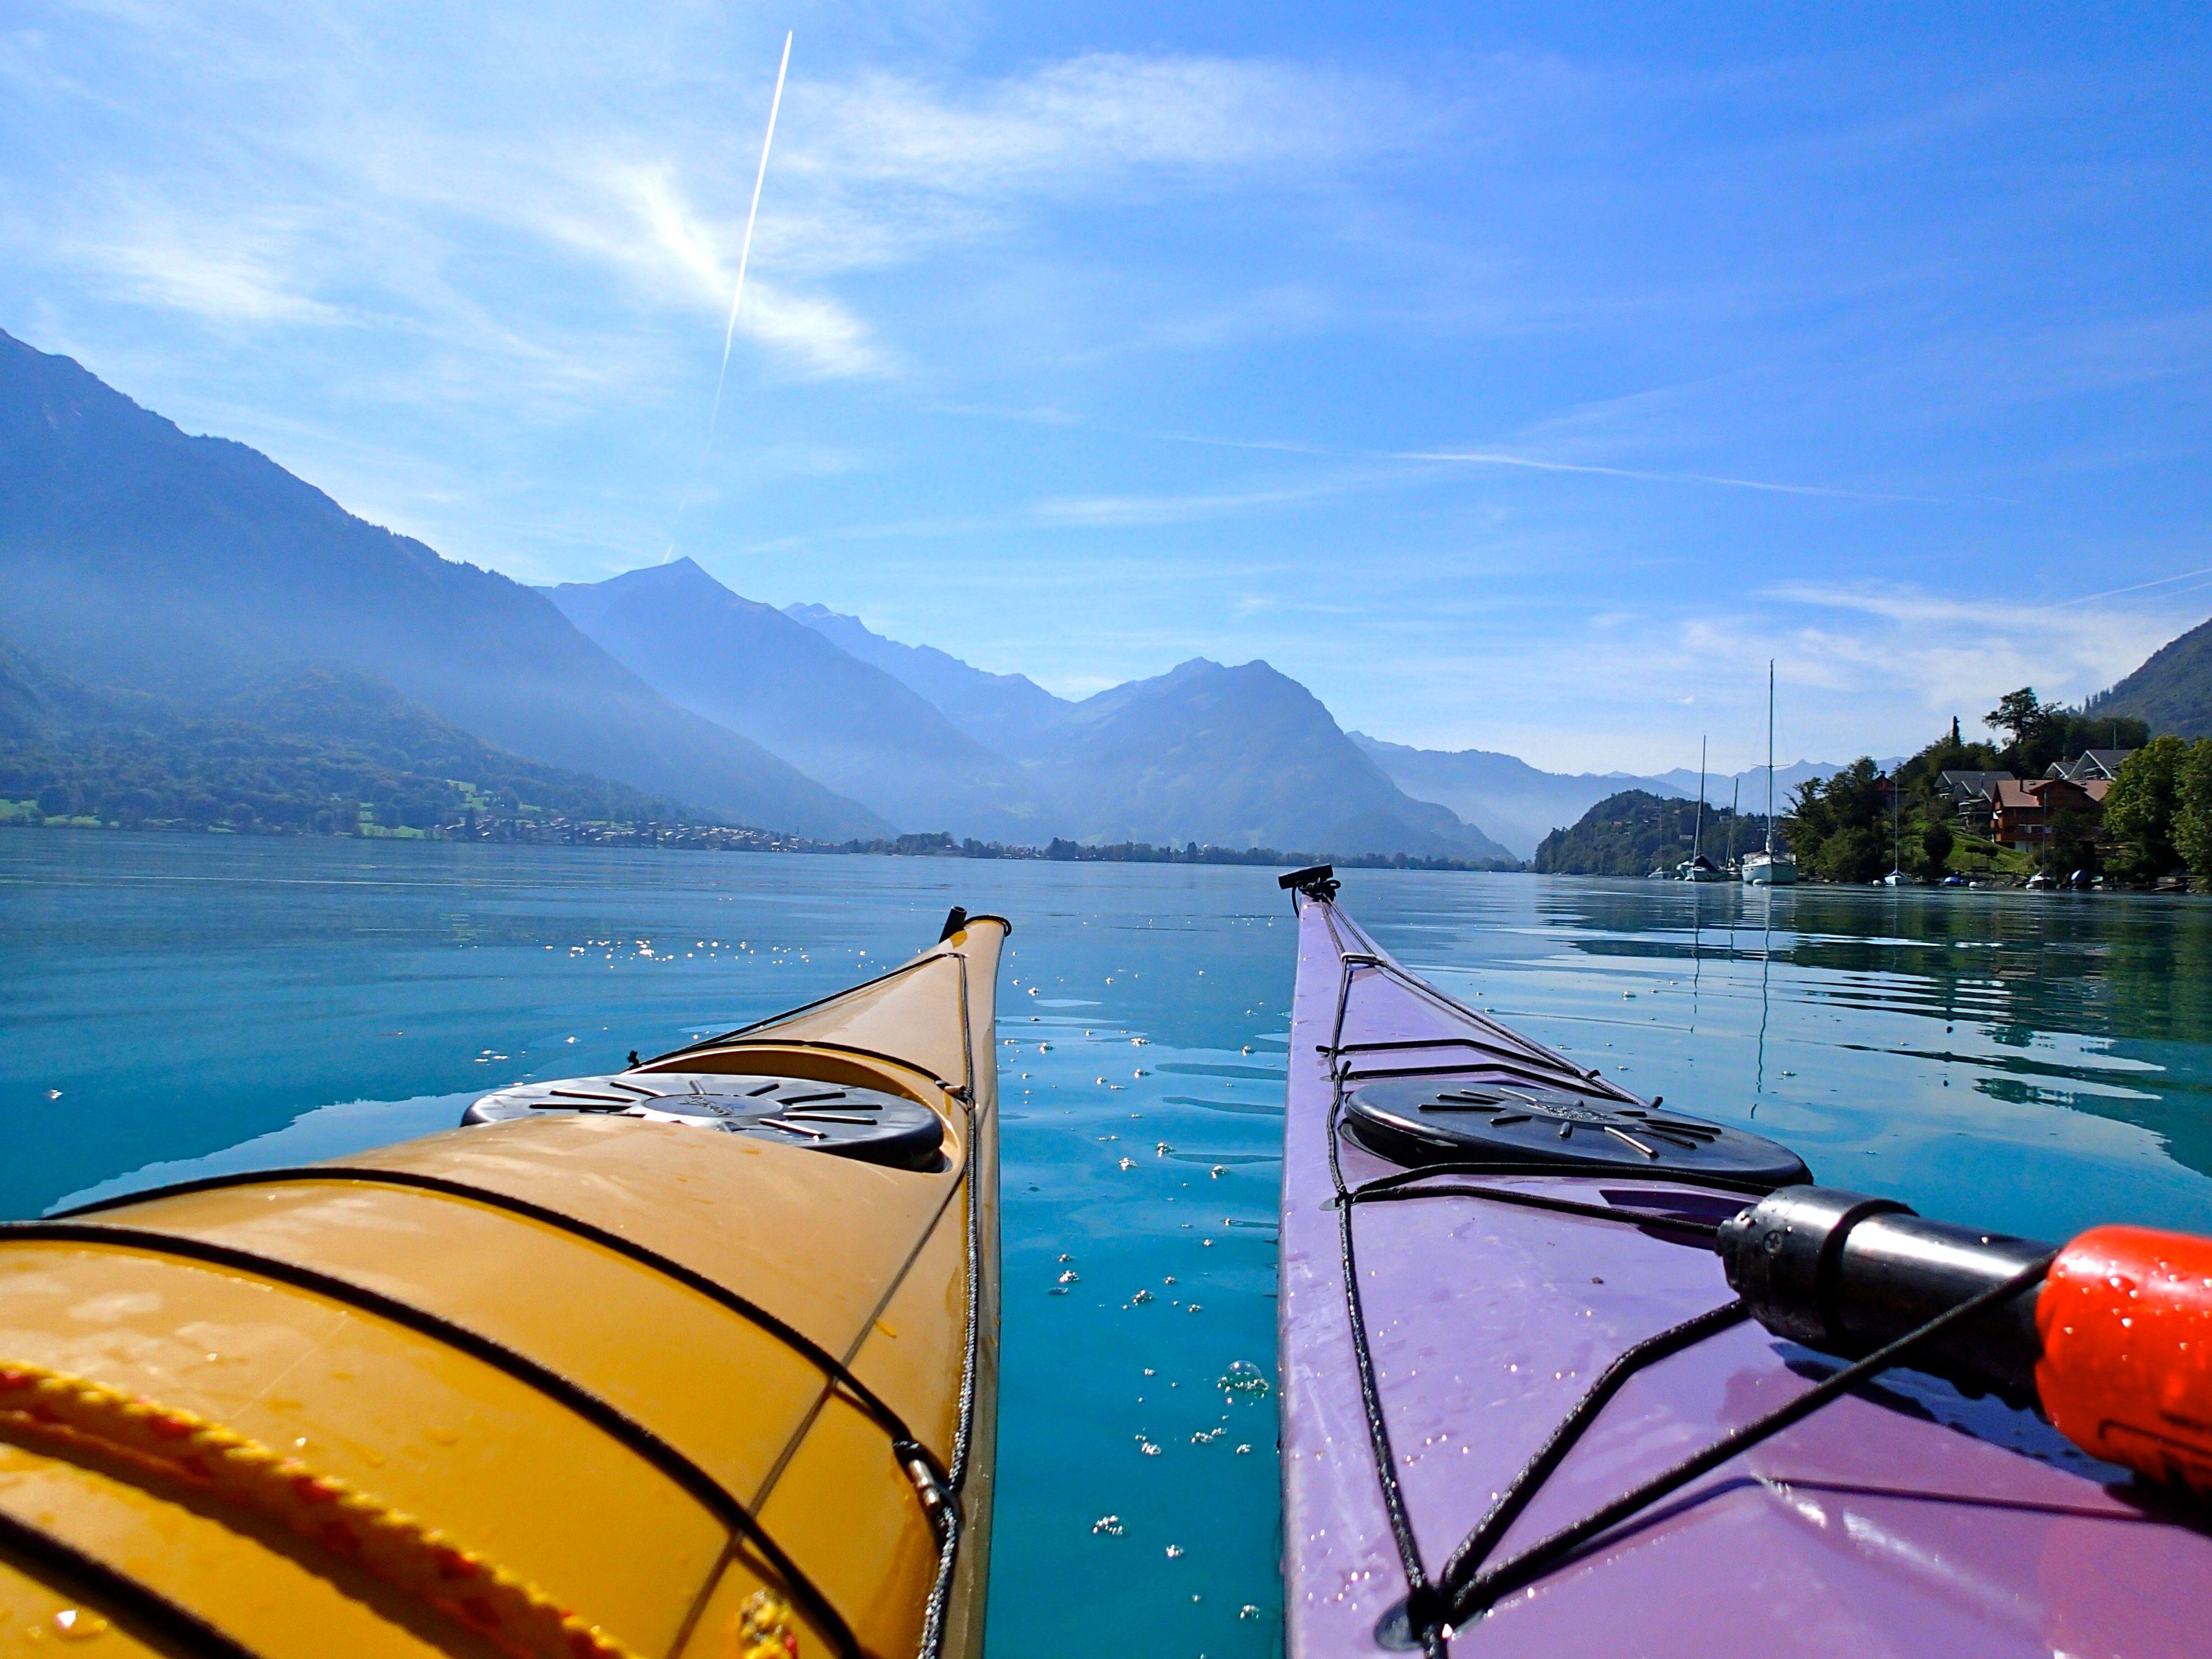 Lake Lucerne, Urnersee: Kayaking Weekend